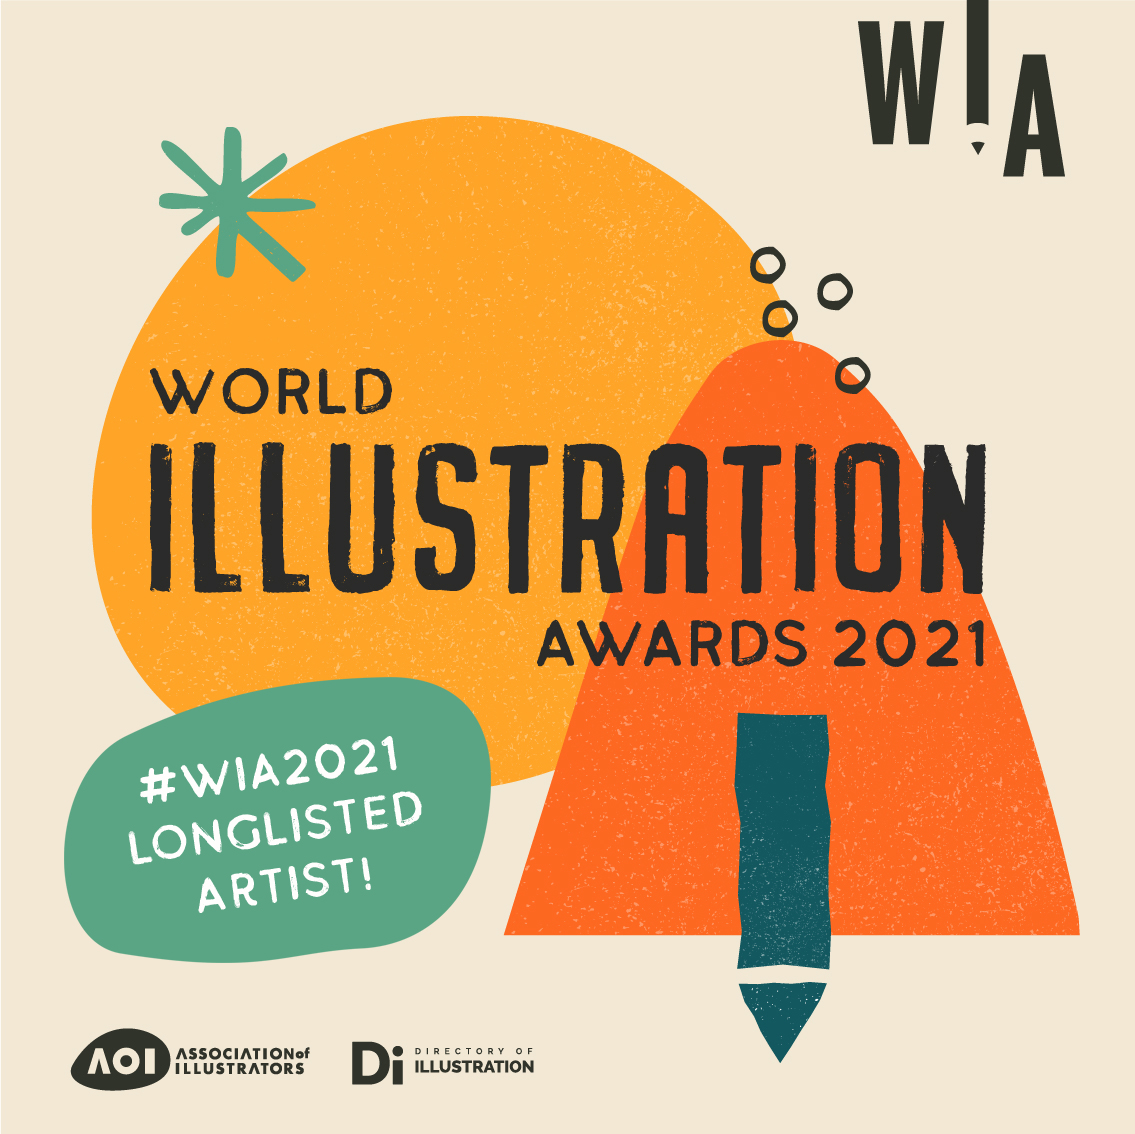 Graphic: World Illustration Award Long Listed Artist